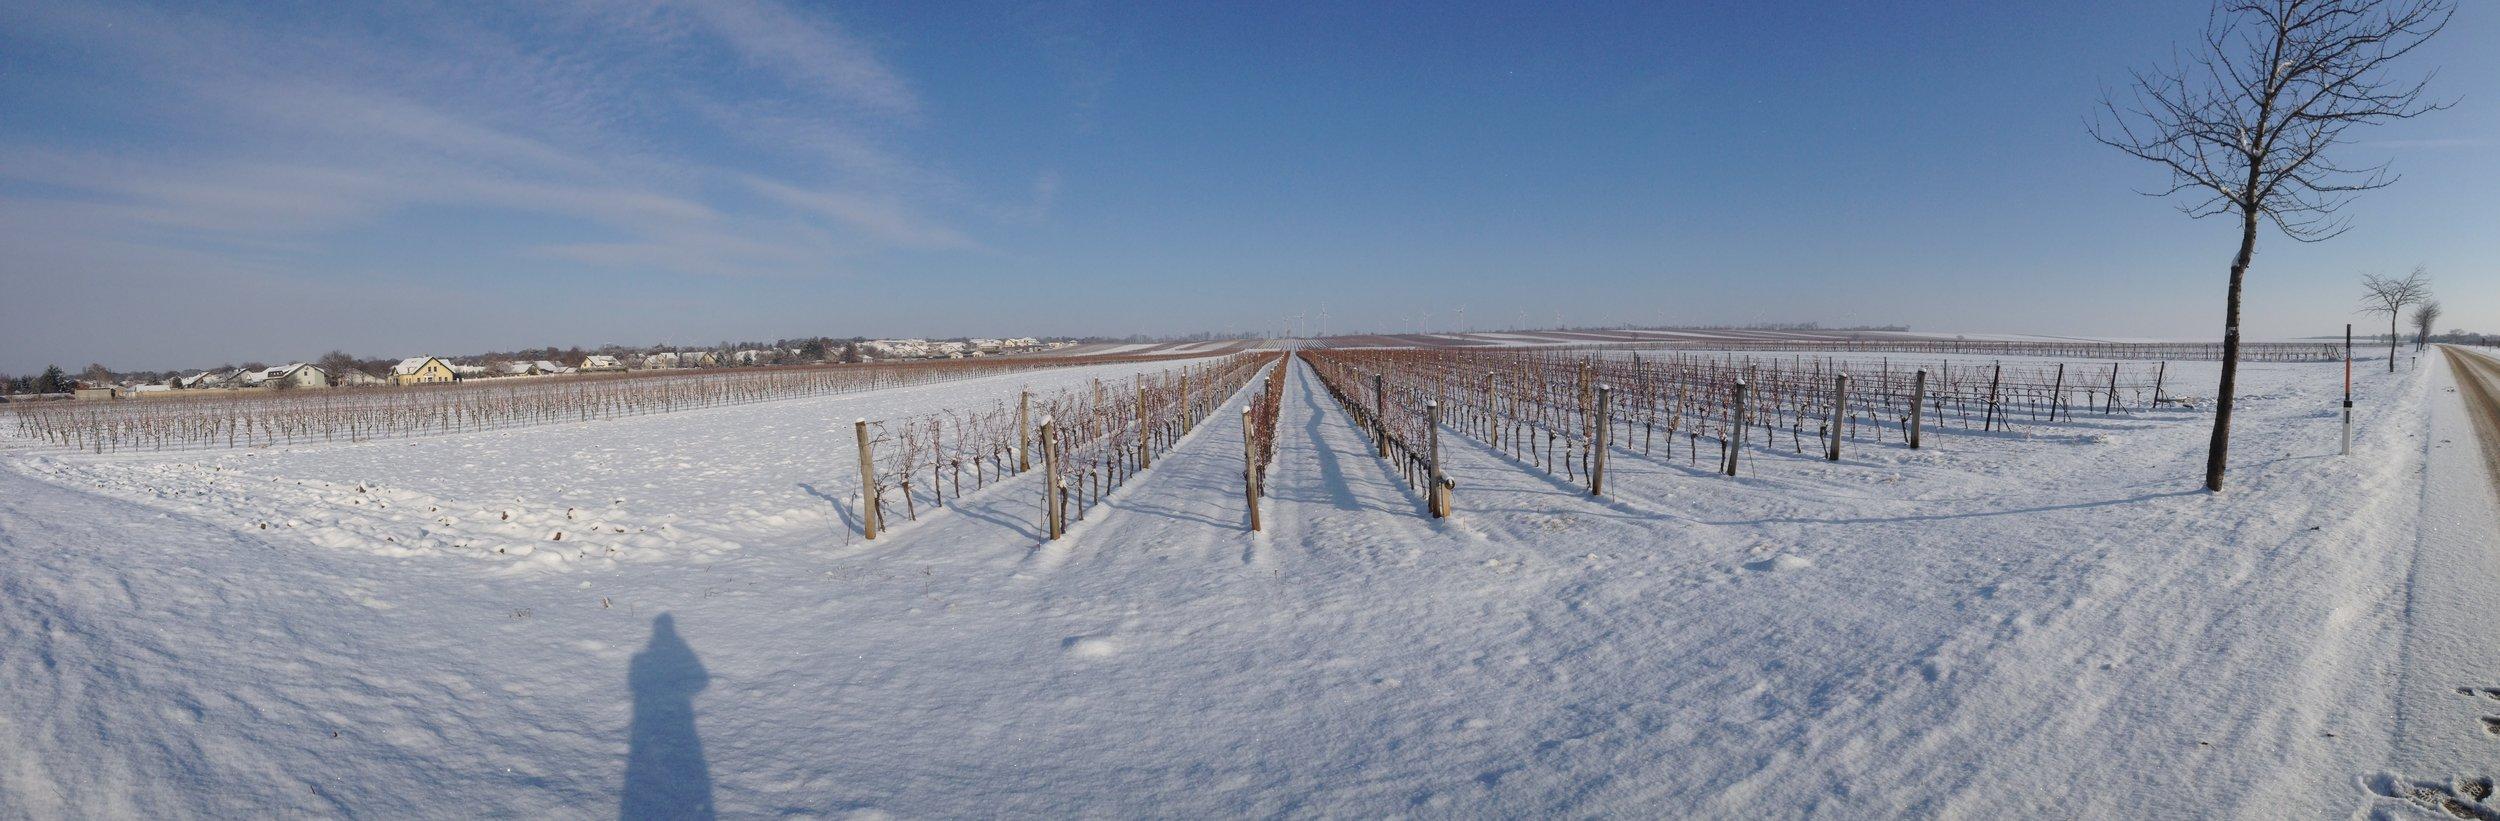 Winter Wenigarten (Photo credit: Artisan Wines)